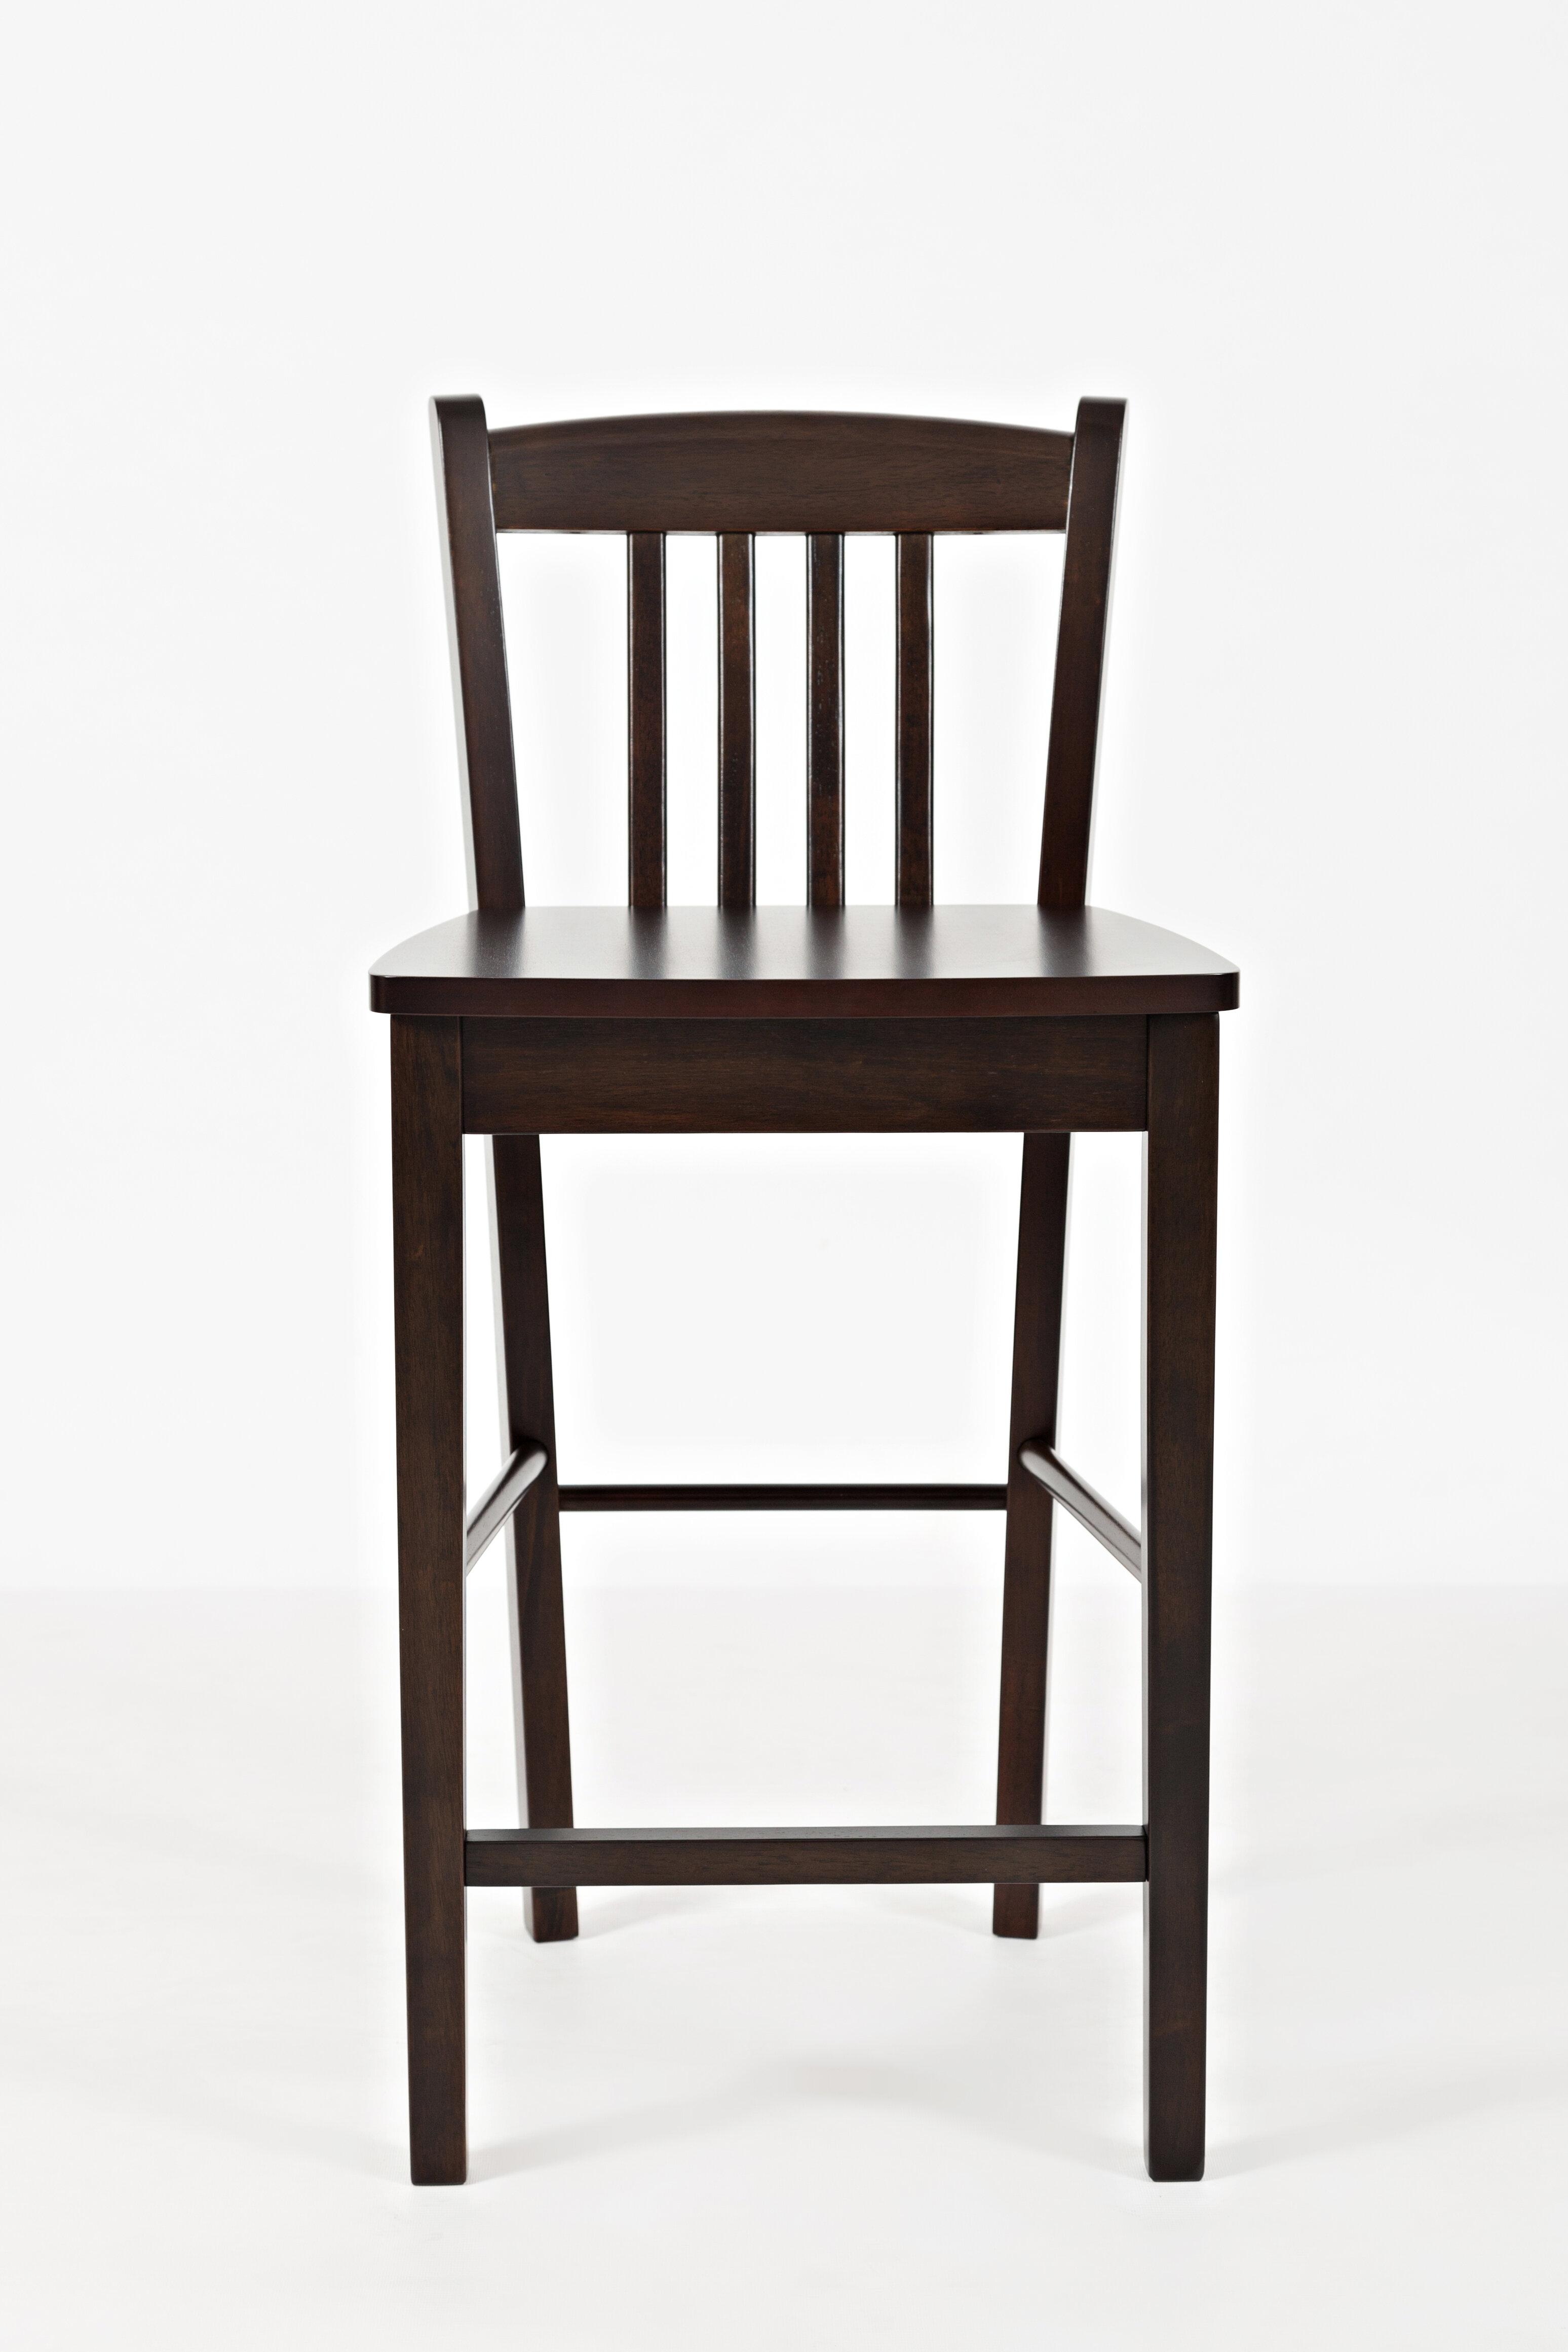 Alcott hill amandes low back counter height 24 bar stool reviews wayfair